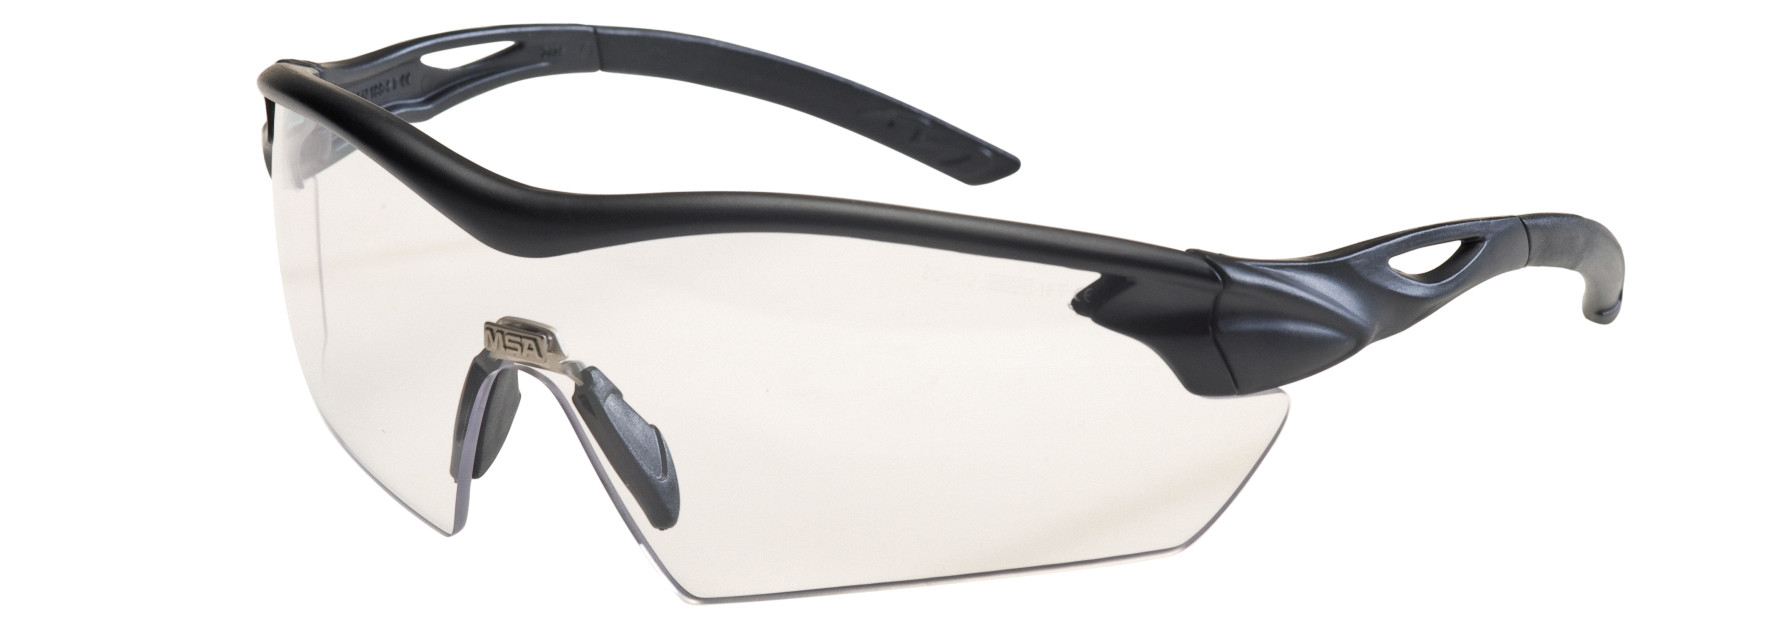 12ST MSA Veiligheidsbril Racers heldere (Transparant)